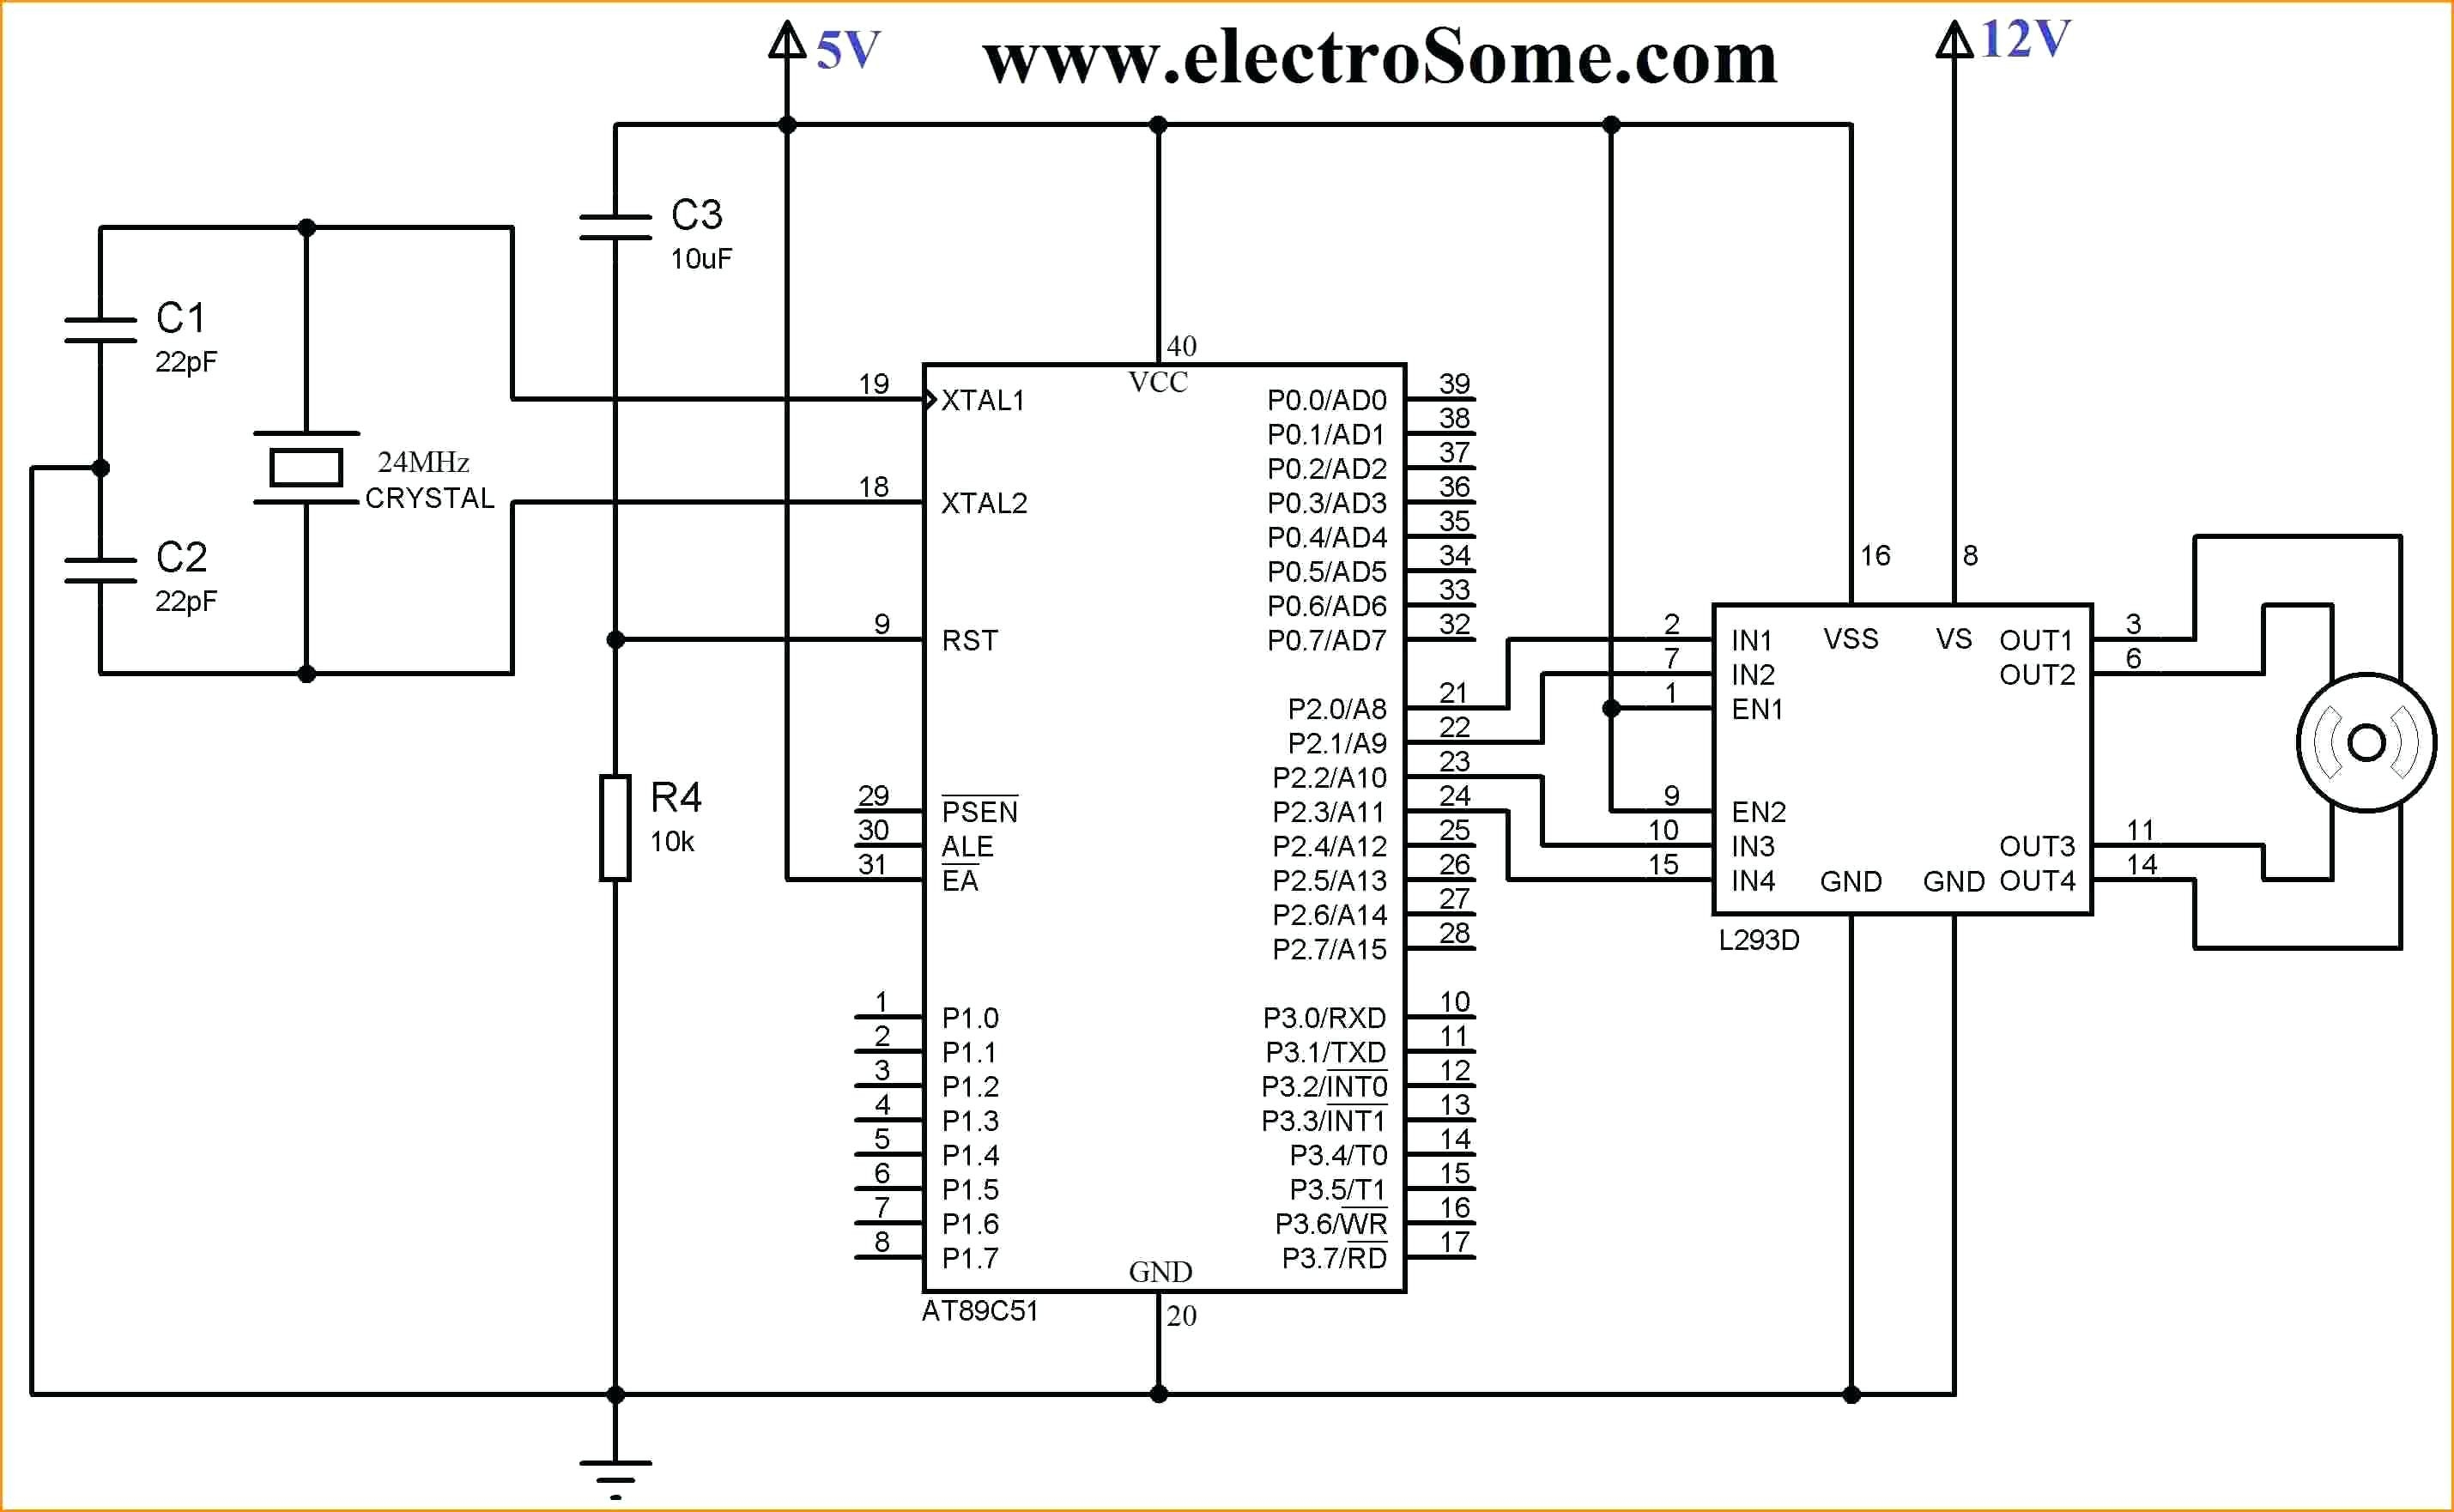 taco zone valve wiring schematic Collection-Wiring Diagram Honeywell 3 Port Zone Valve Save Taco Circulator Pump Wiring Diagram Lovely Honeywell Zone 18-f